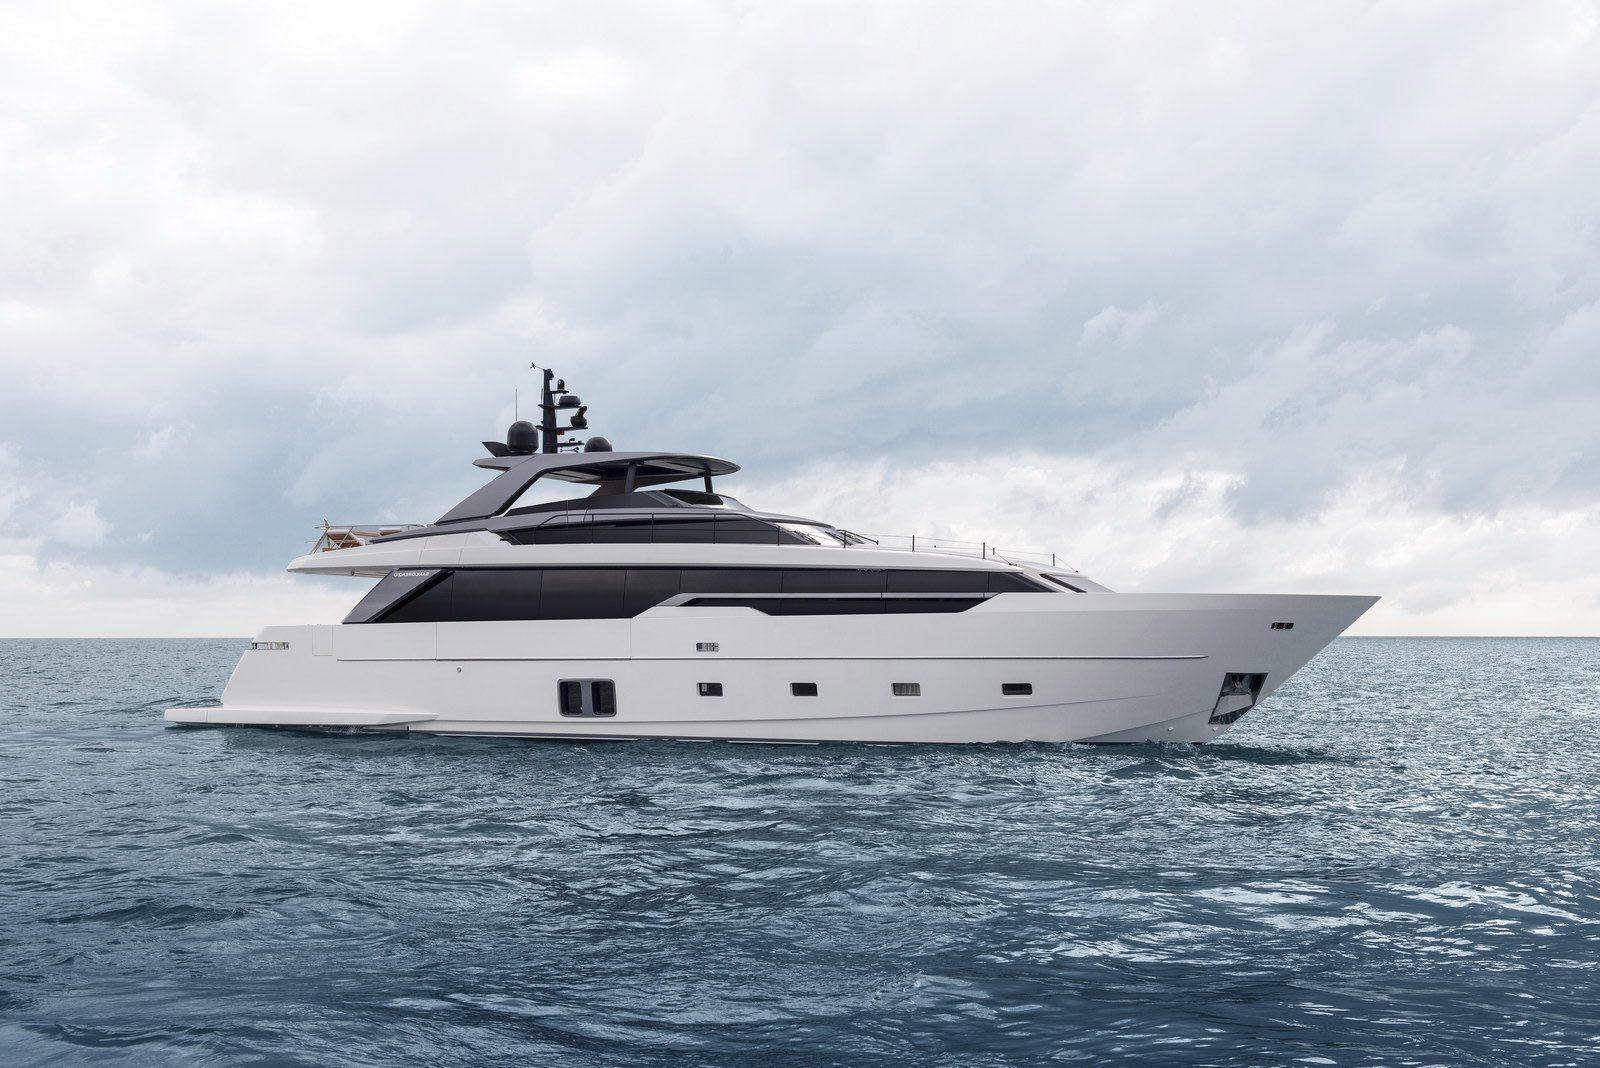 Simpson Marine - SL96 Asymmetric